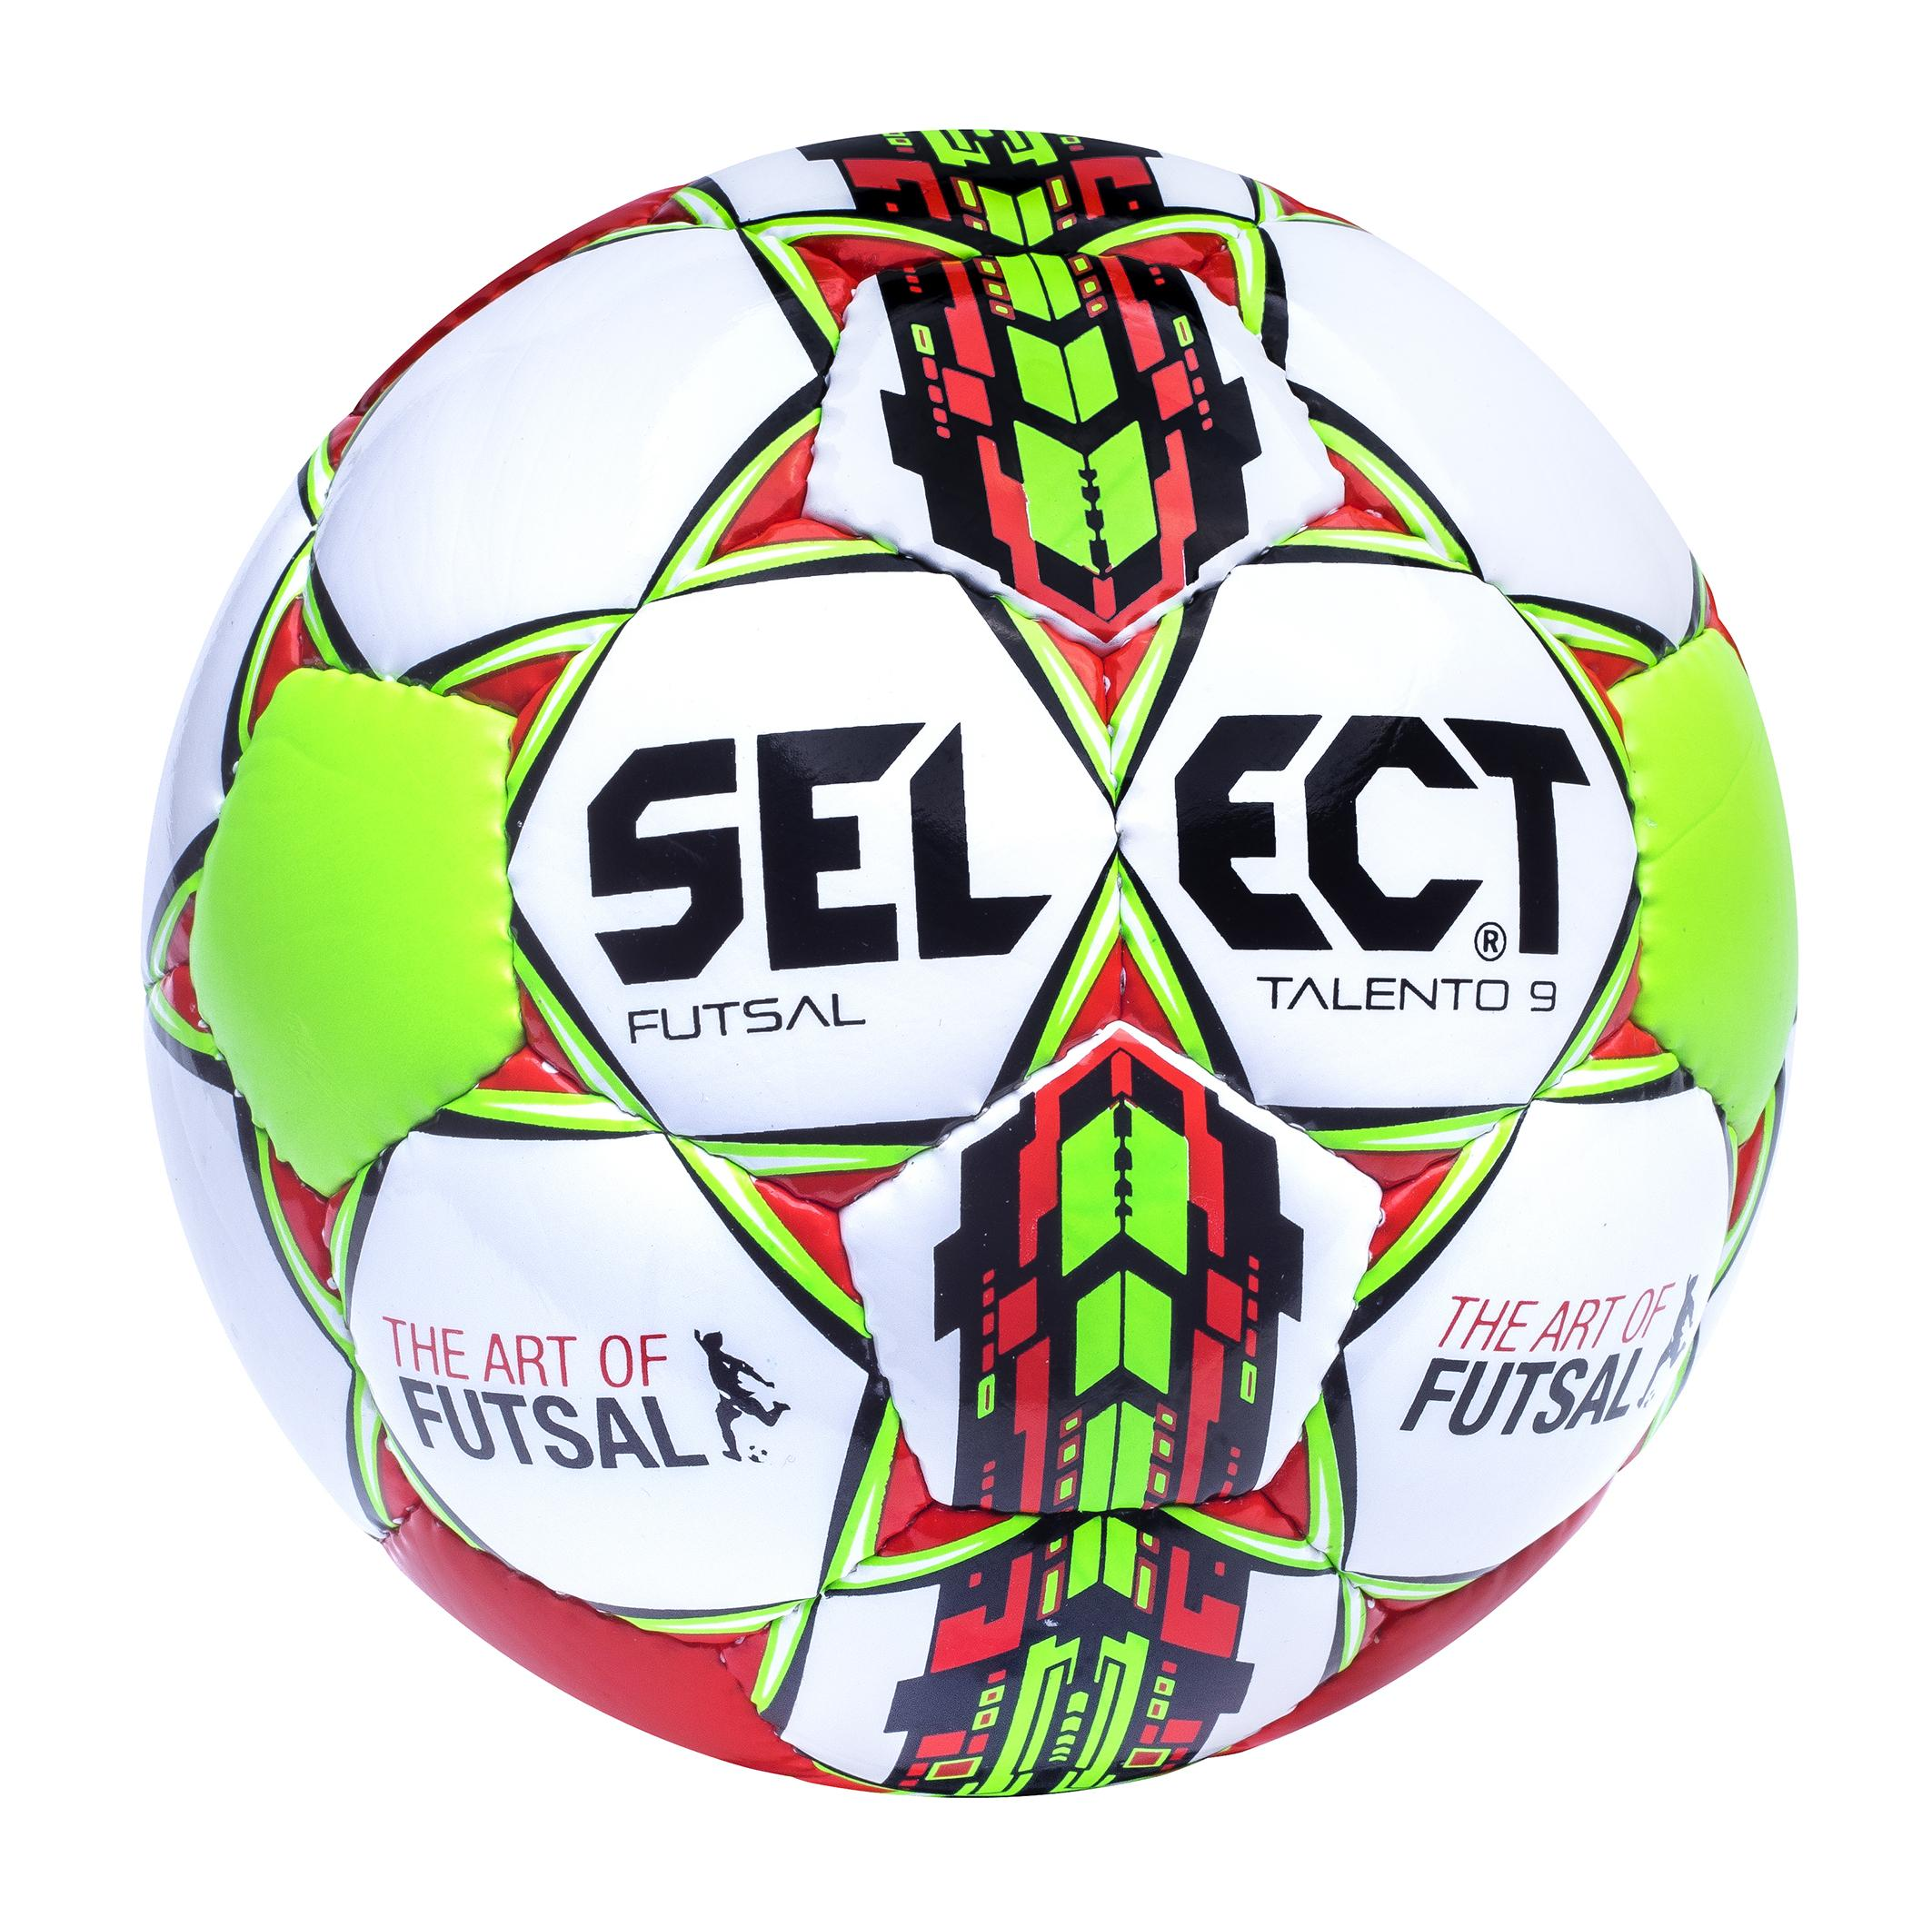 Select Fotboll Futsal Talento 9 Vit/Grön/Röd Barn